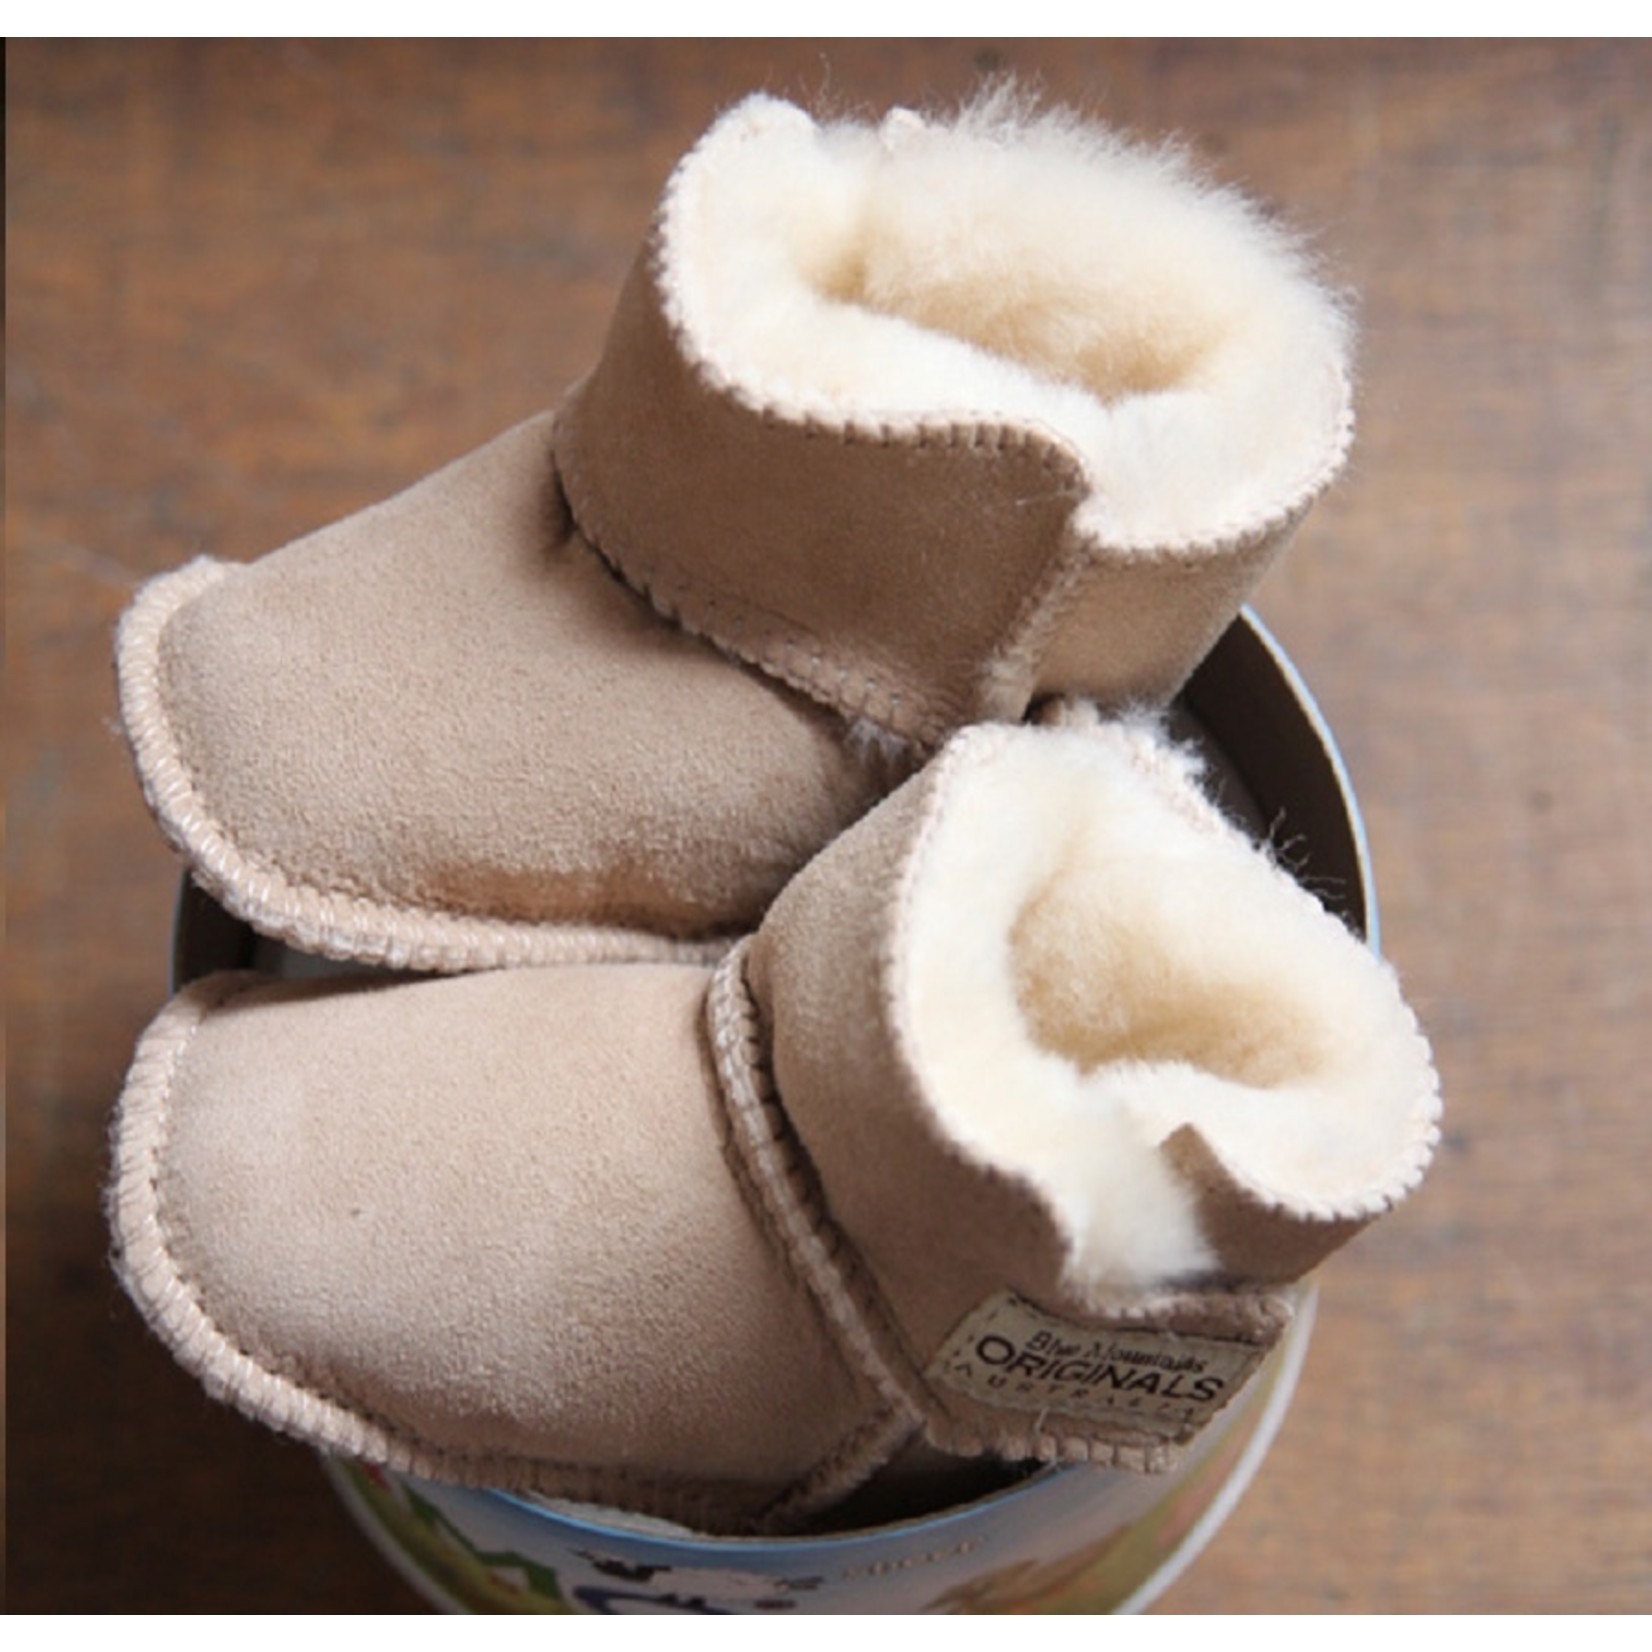 BMO Baby Boot Velcro chestnut